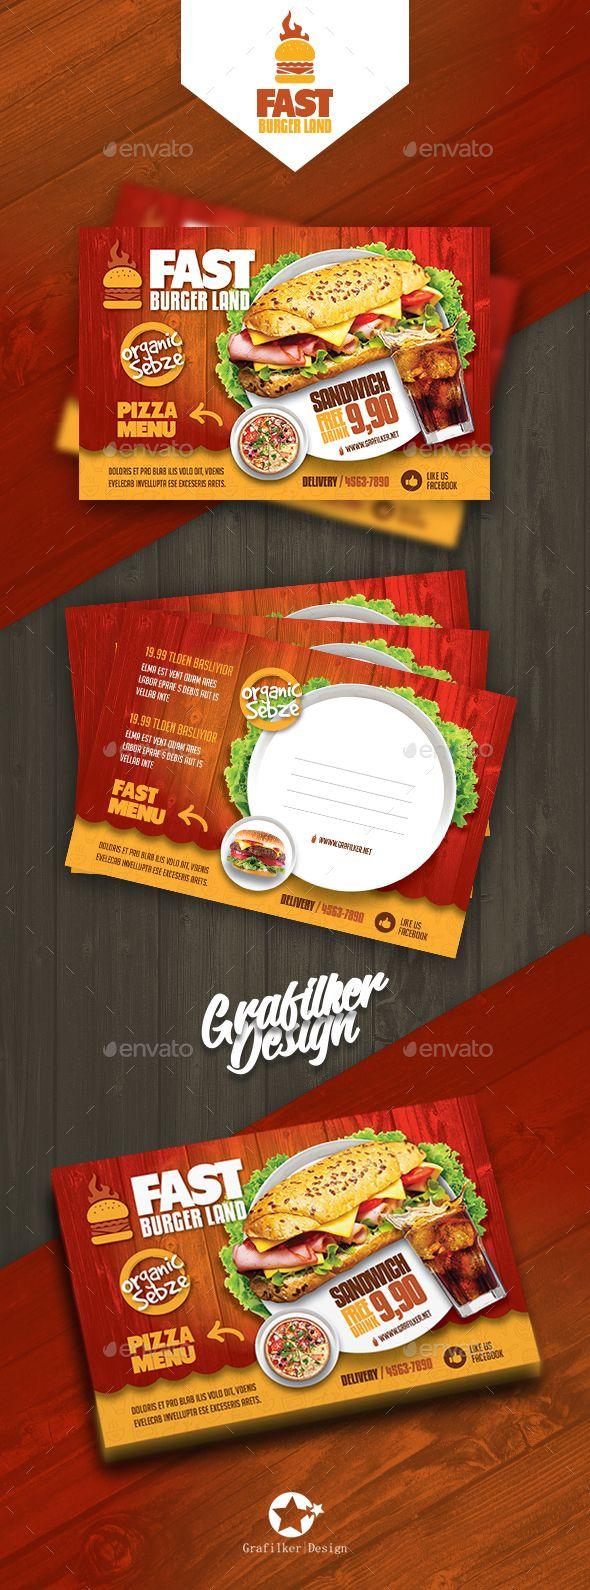 Restaurant Postcard Templates Cards Invites Print Templates Postcard Template Food Poster Design Mailer Design